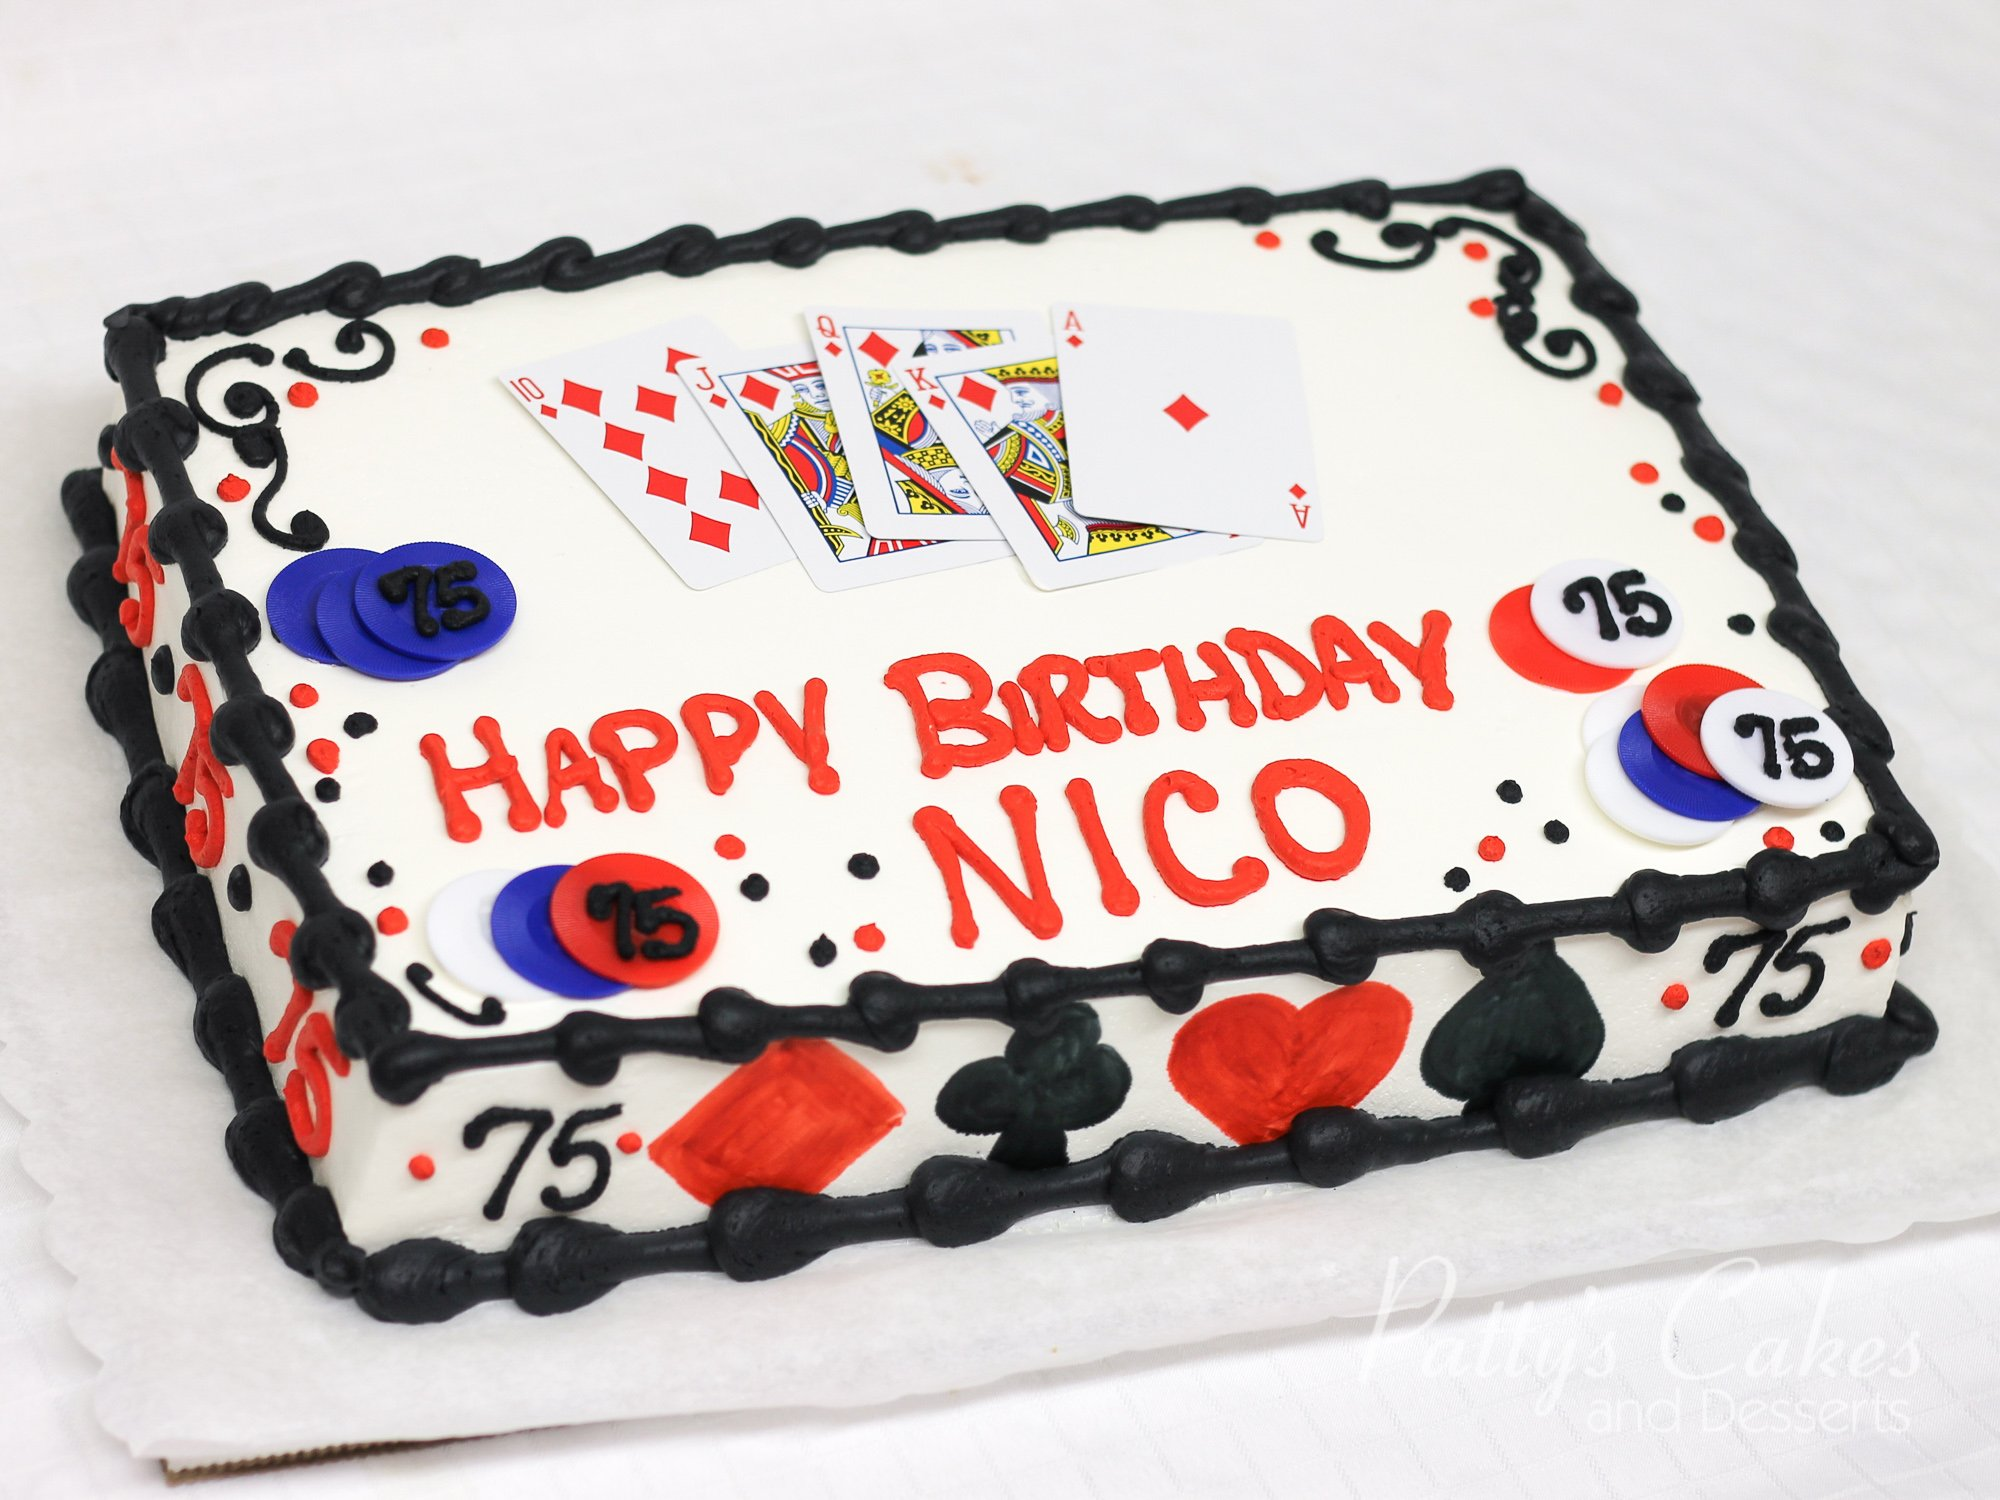 Stupendous Photo Of A Casino Poker Theme Birthday Cake Pattys Cakes And Personalised Birthday Cards Arneslily Jamesorg